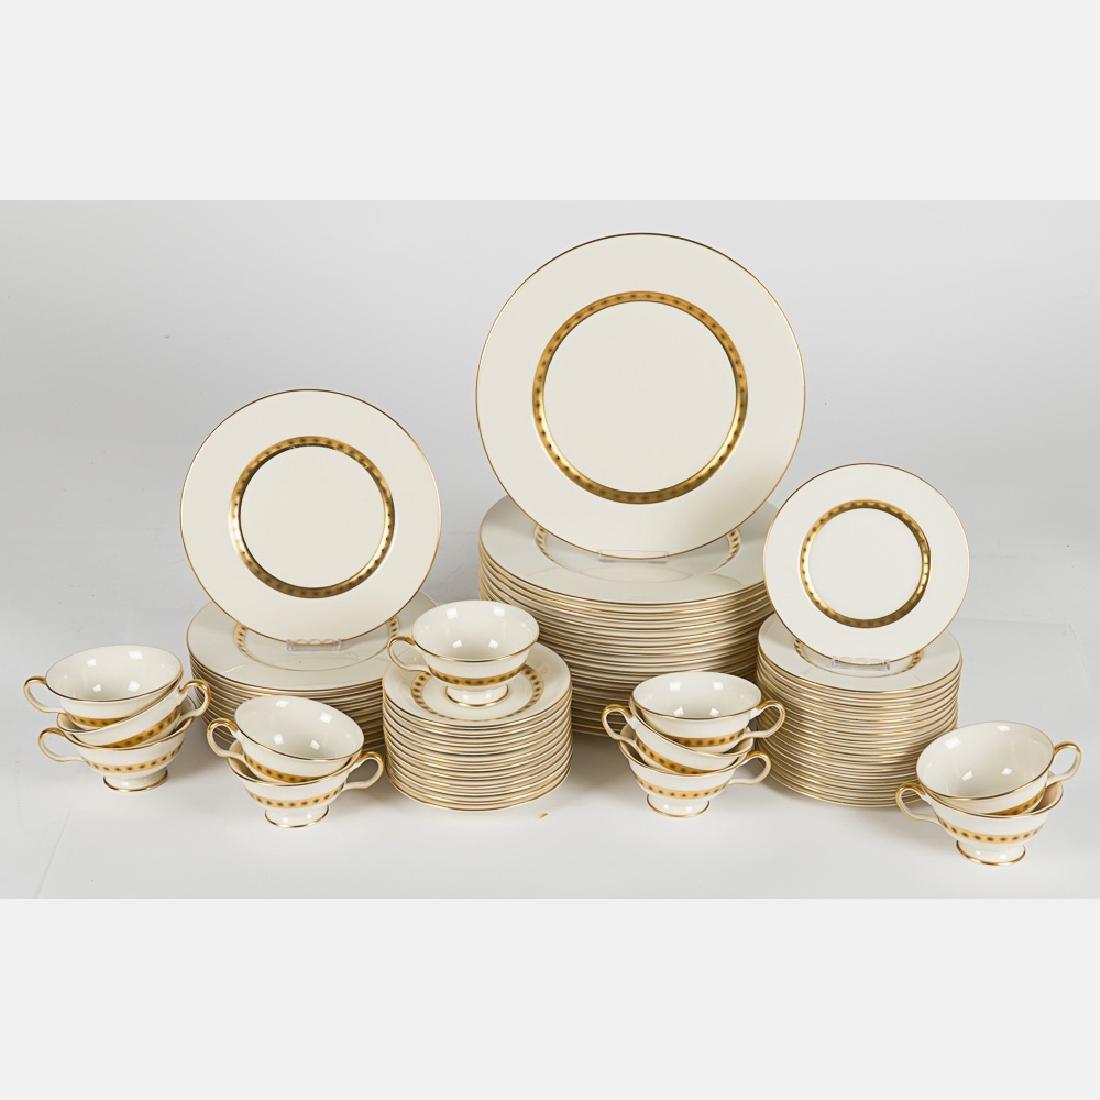 A Partial Castleton Porcelain Dinner Service in the - 2